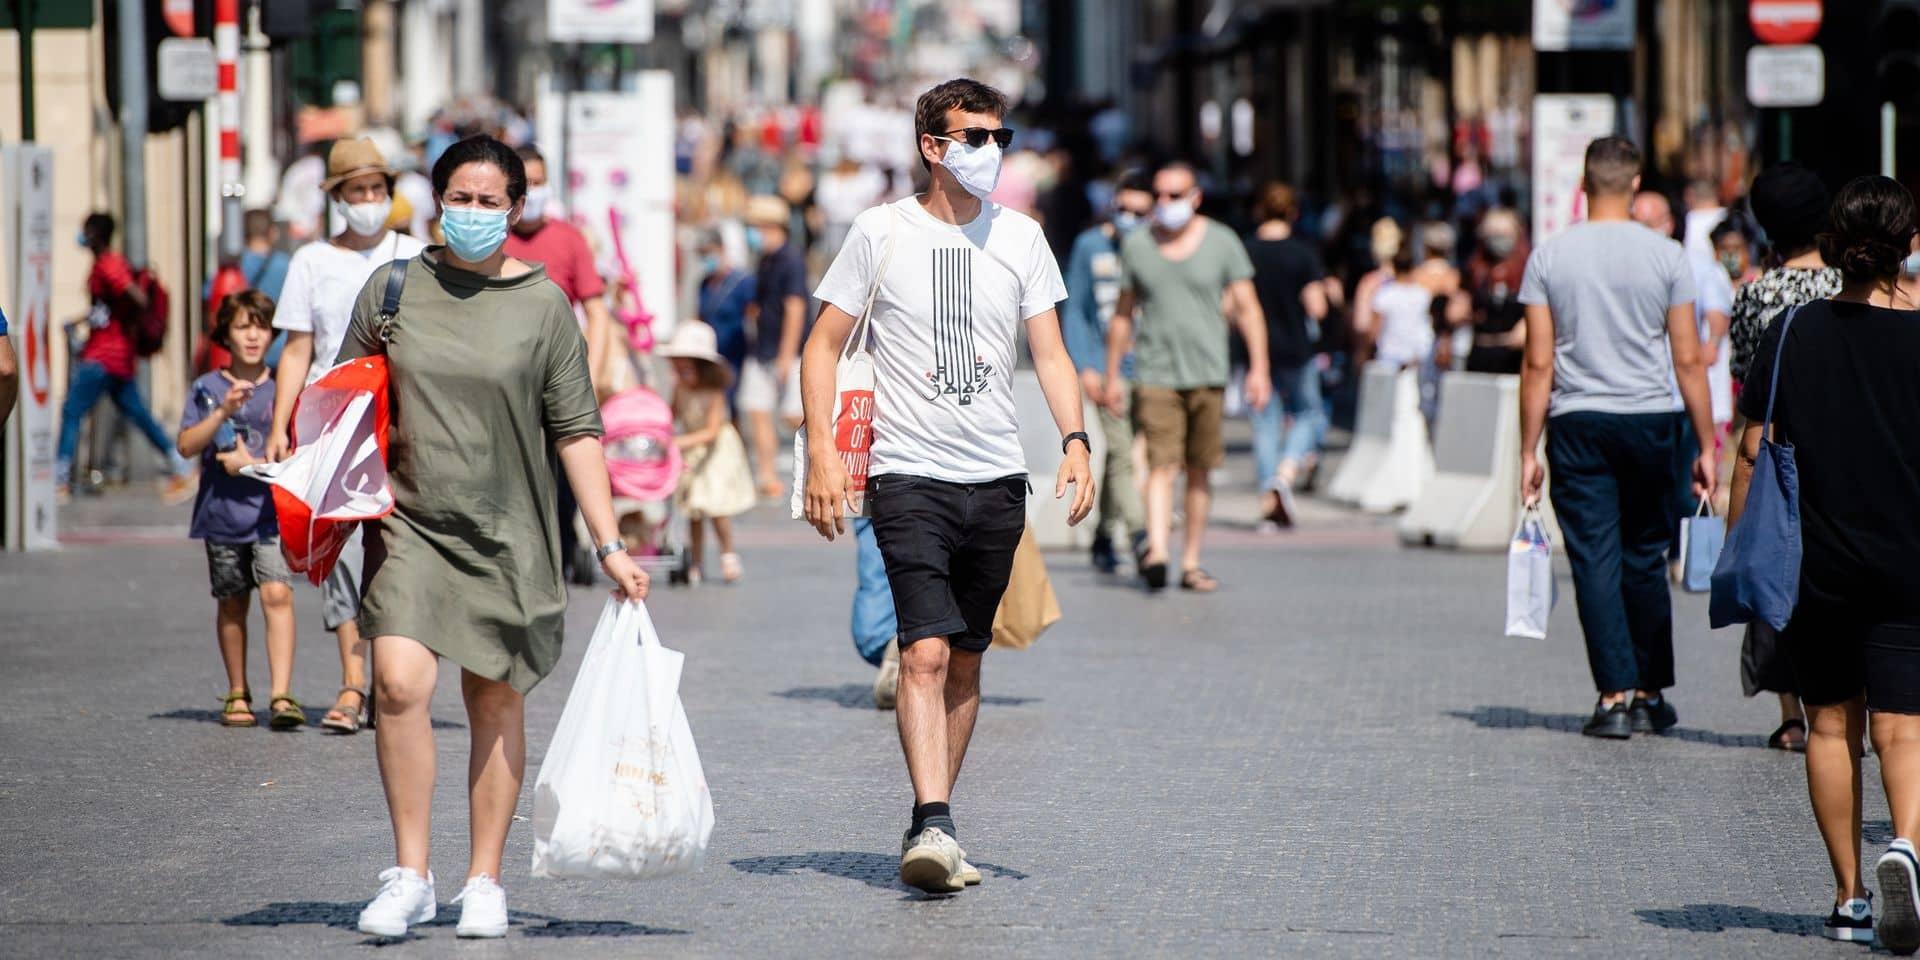 Bruxelles: le port du masque ne sera plus obligatoire, sauf dans certaines zones